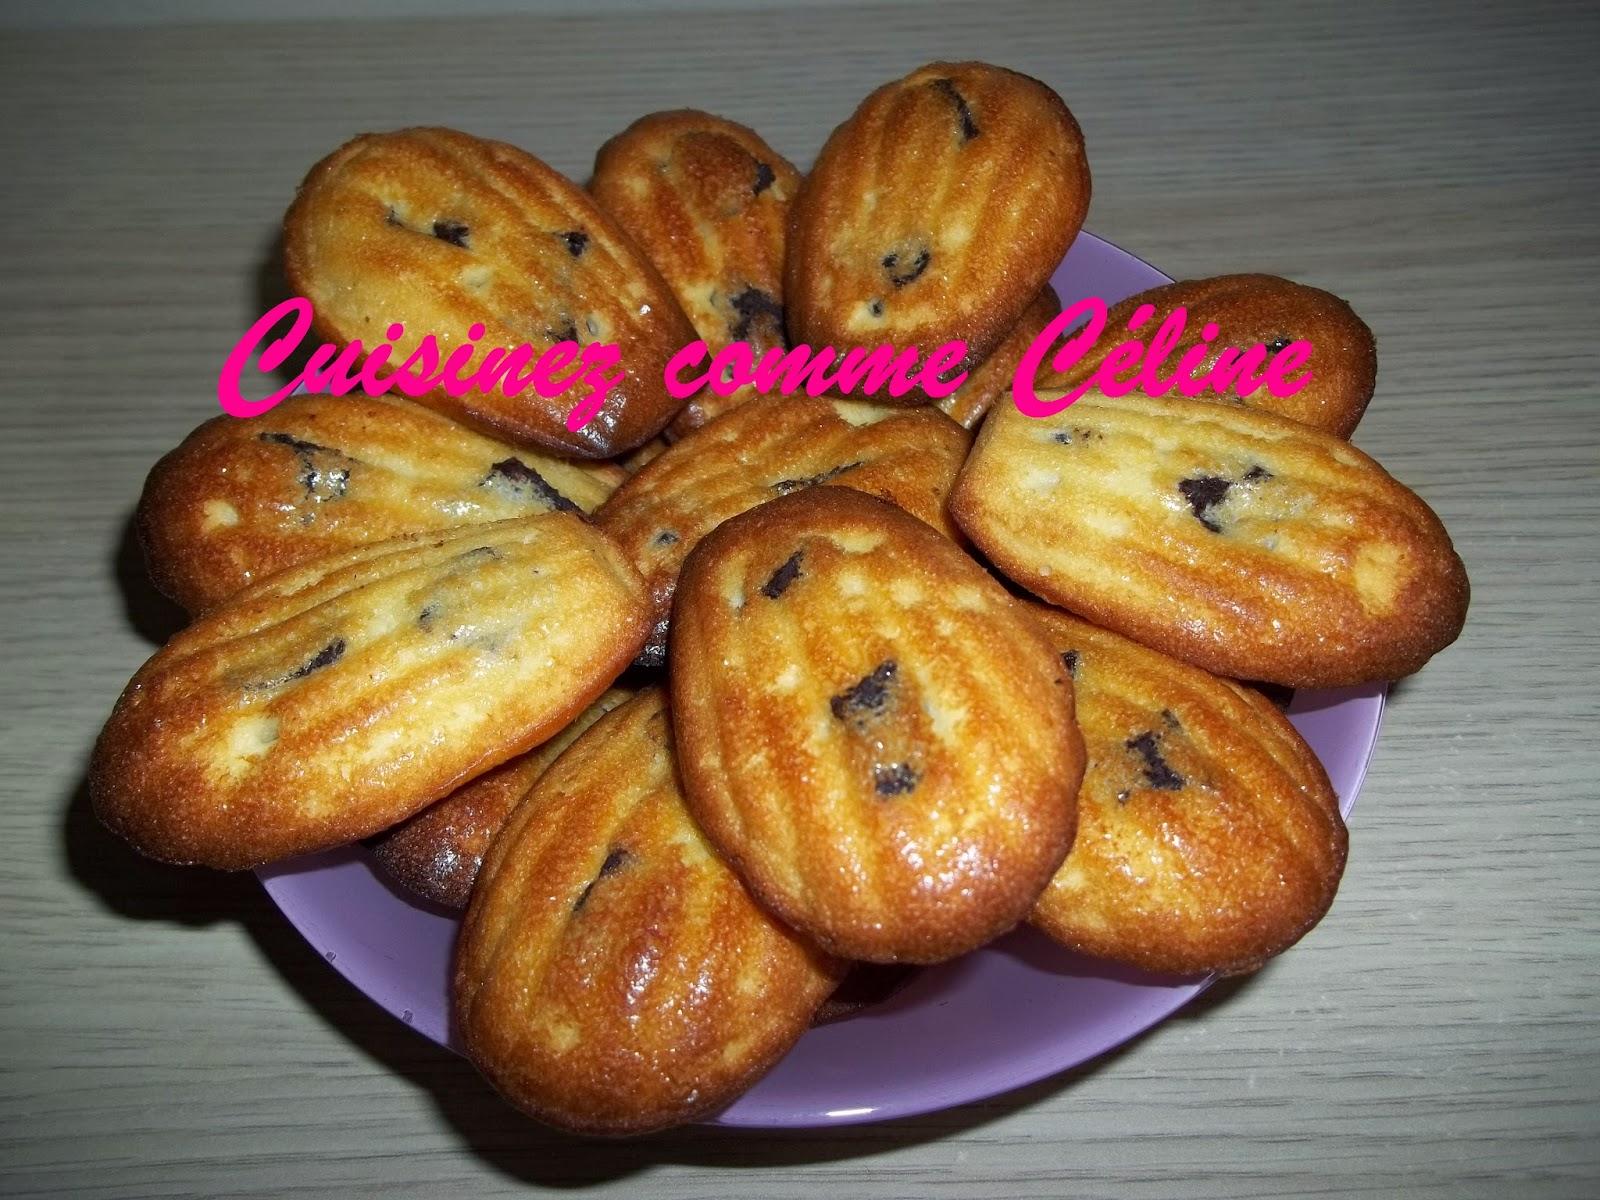 http://cuisinezcommeceline.blogspot.fr/2015/04/madeleines-chocolat.html